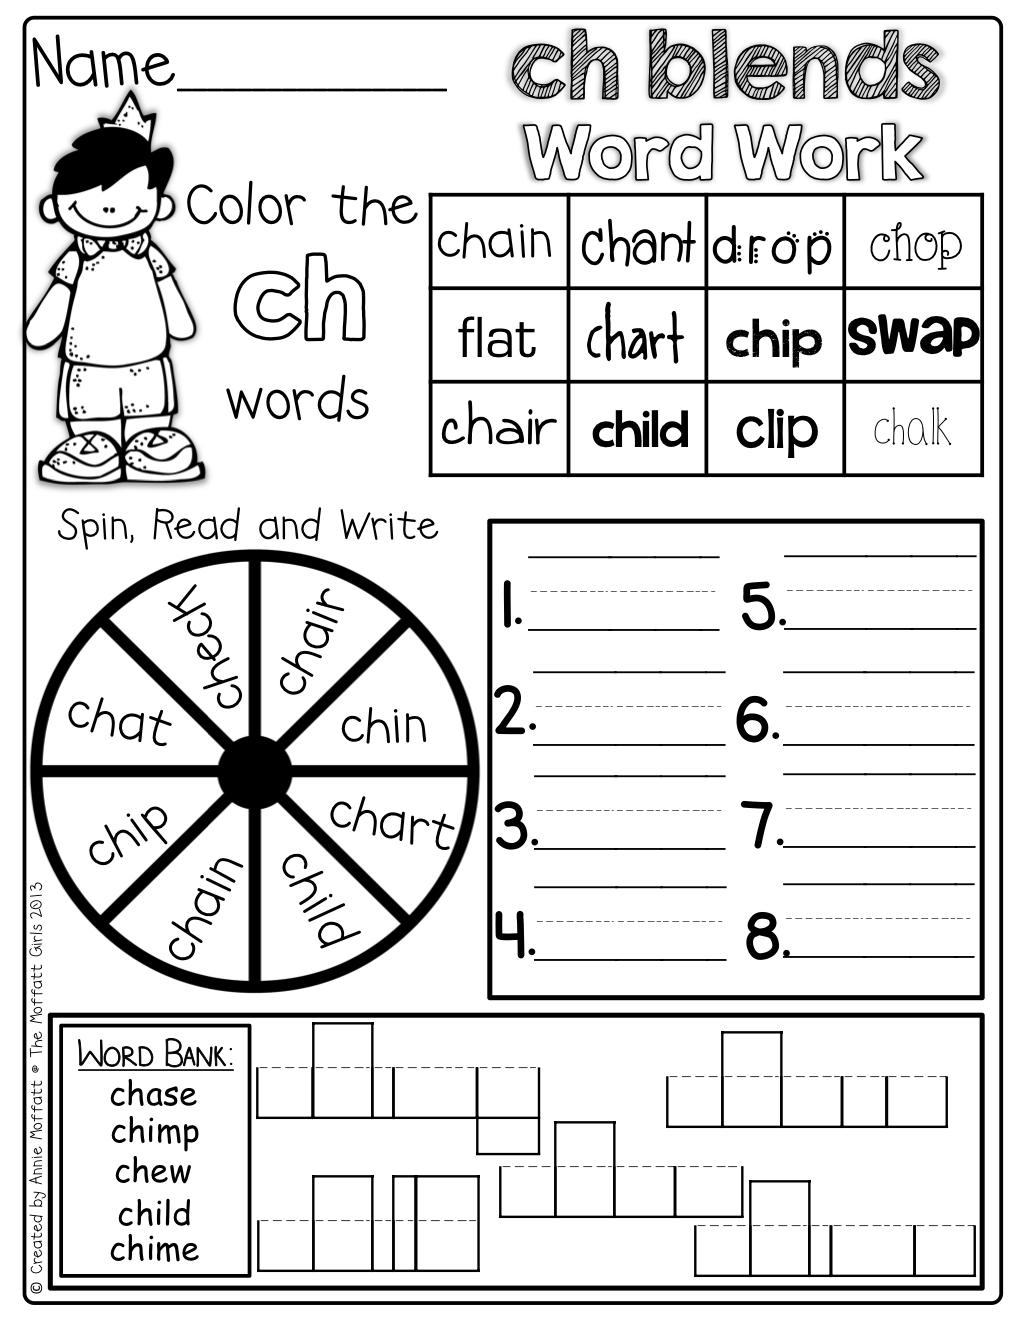 Word Work at its BEST! Blends, Digraphs, CVC words, CVCe